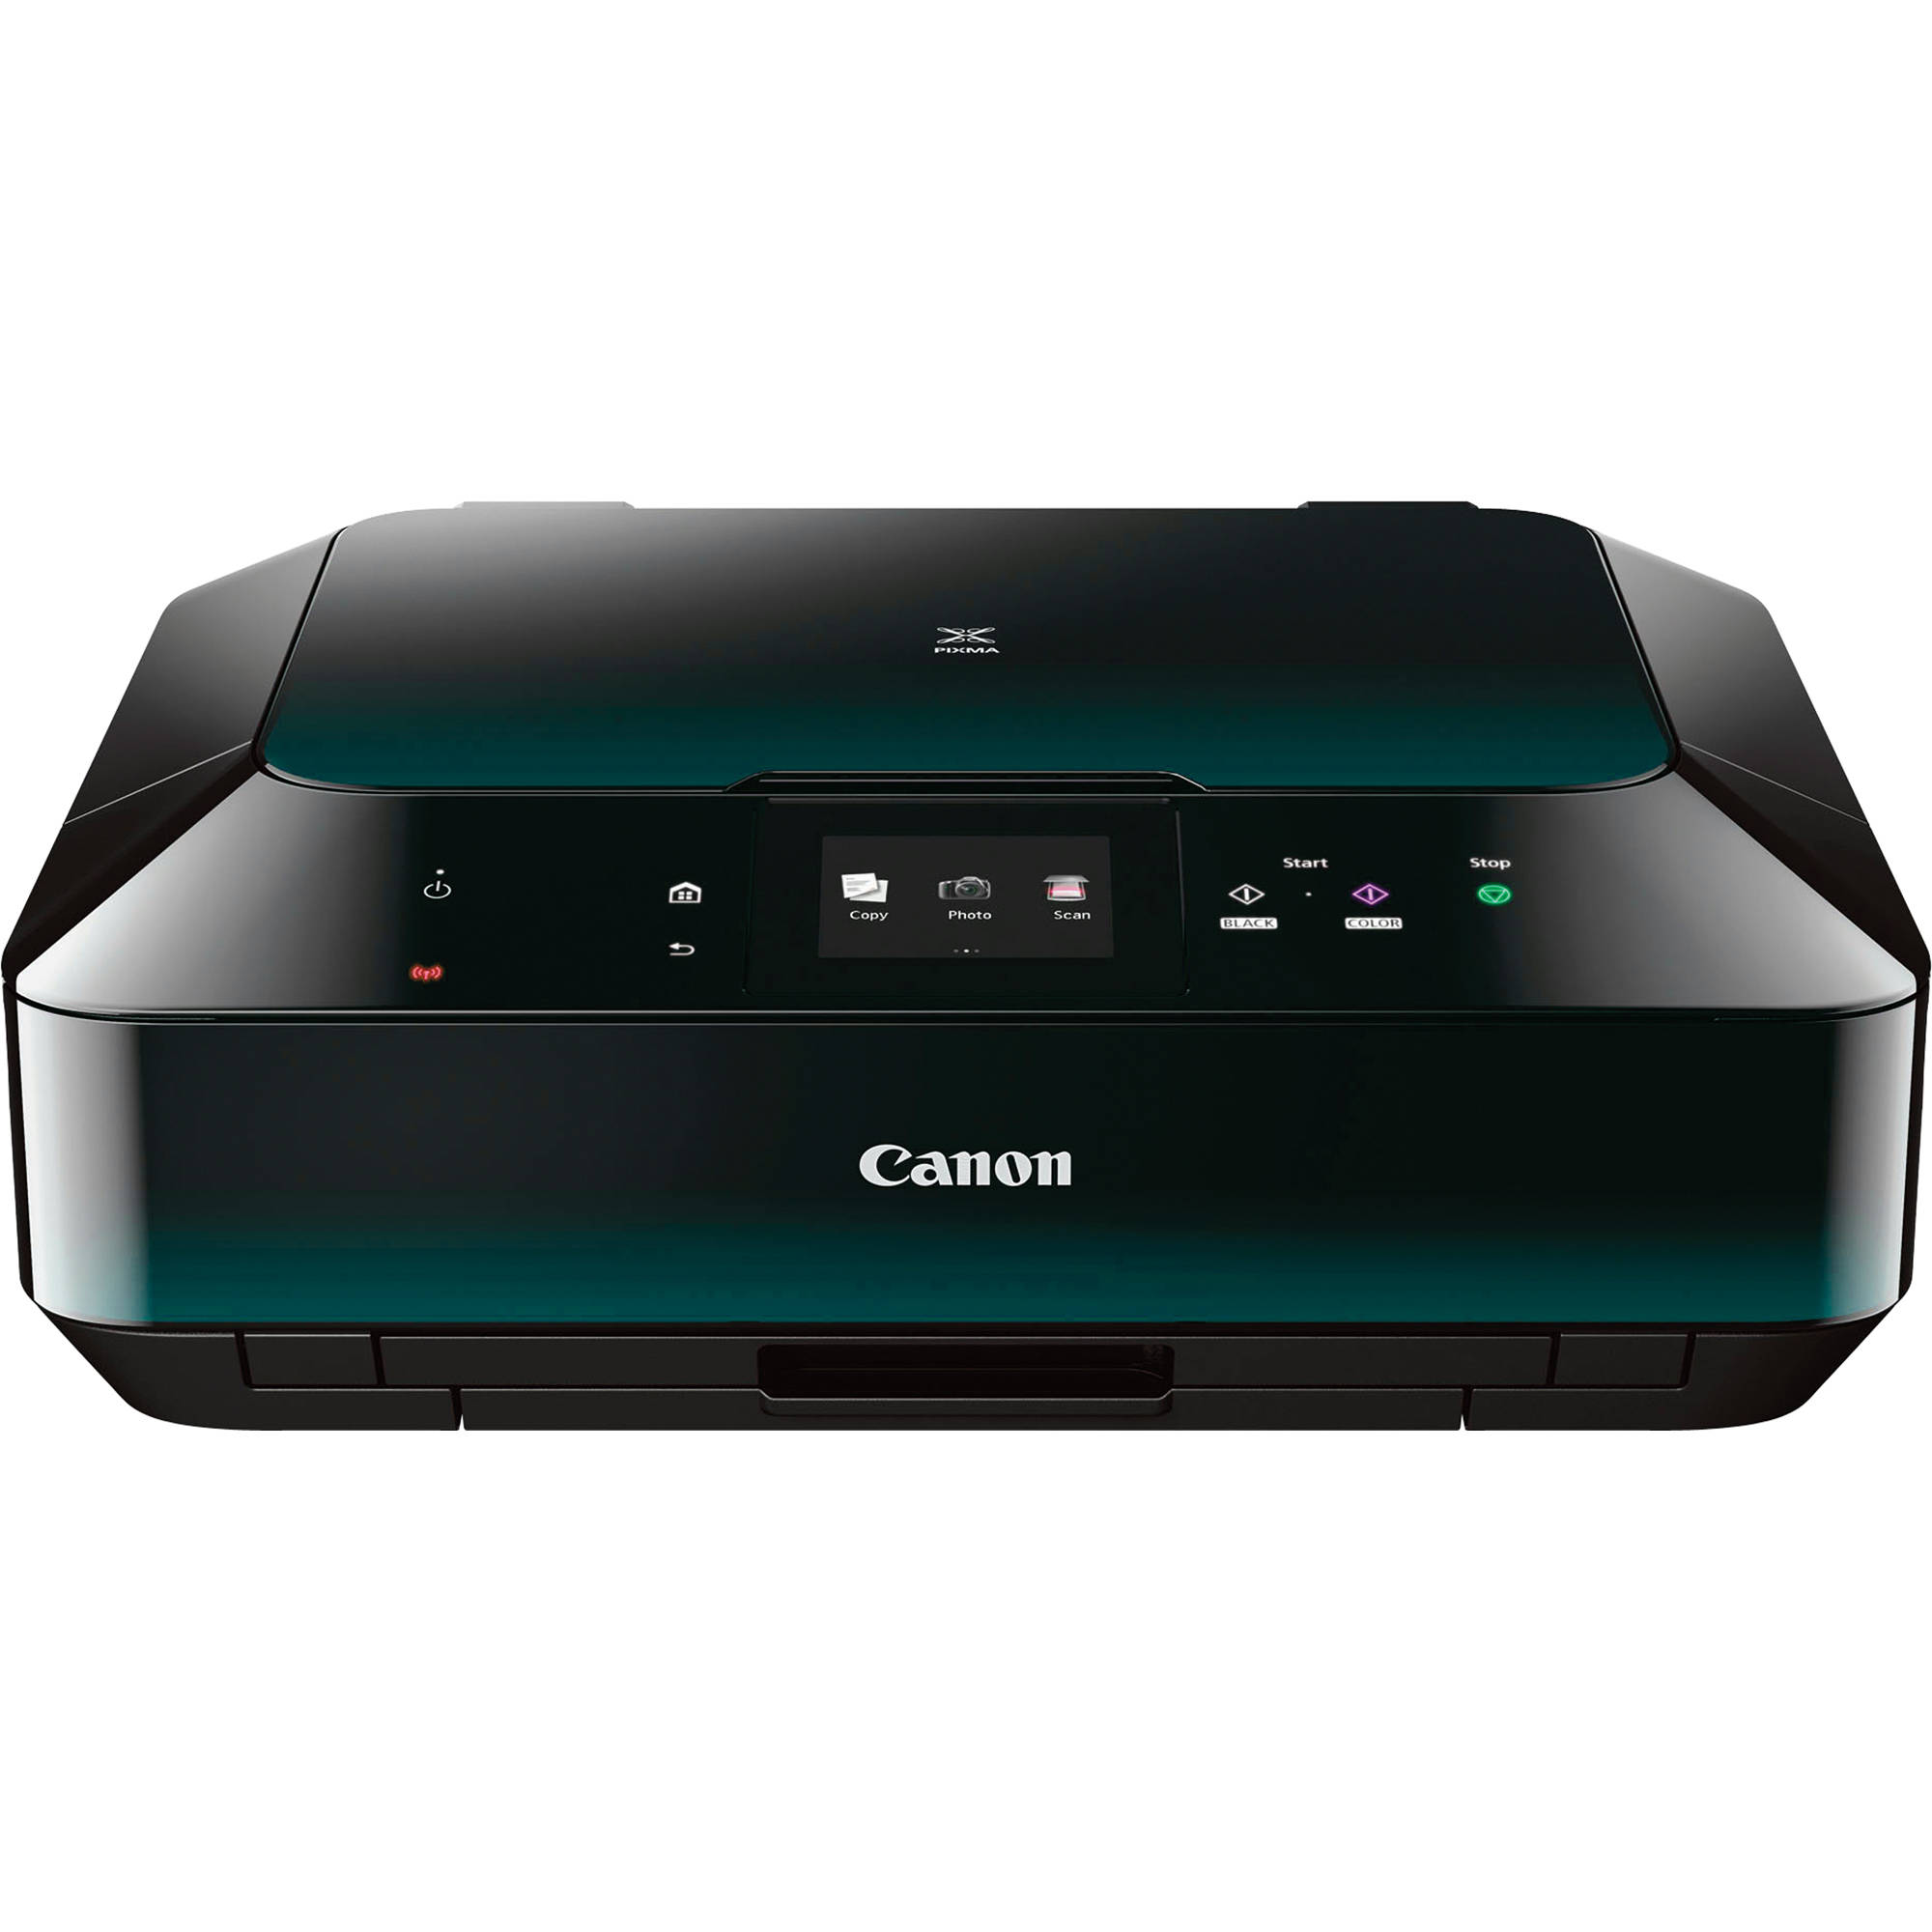 Canon Pixma Pro  Color Inkjet Wireless Photo Printer